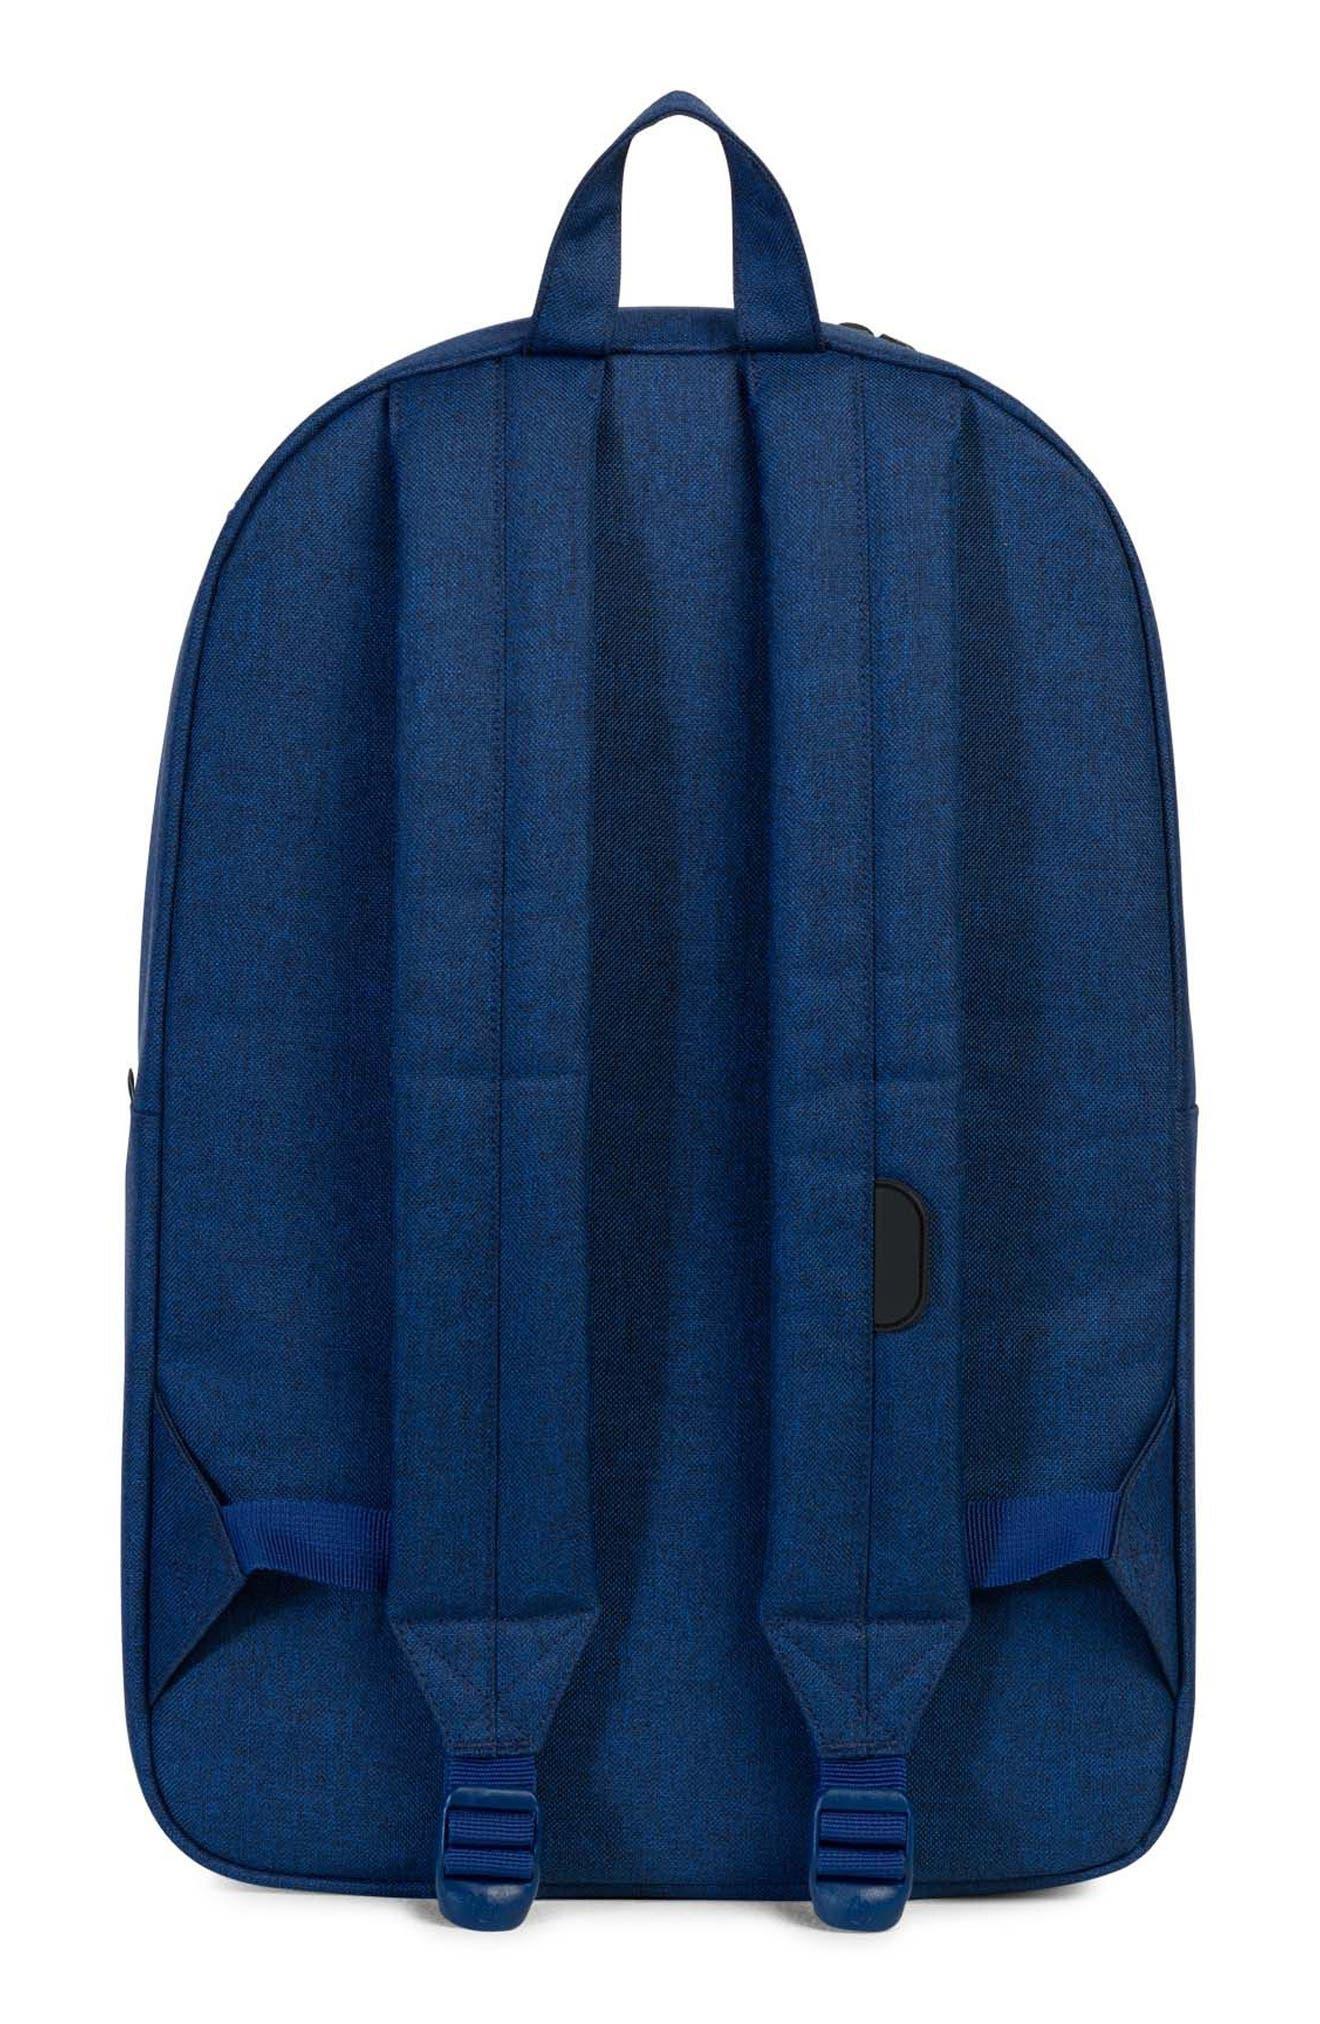 Heritage Backpack,                             Alternate thumbnail 3, color,                             Eclipse Crosshatch/ Black